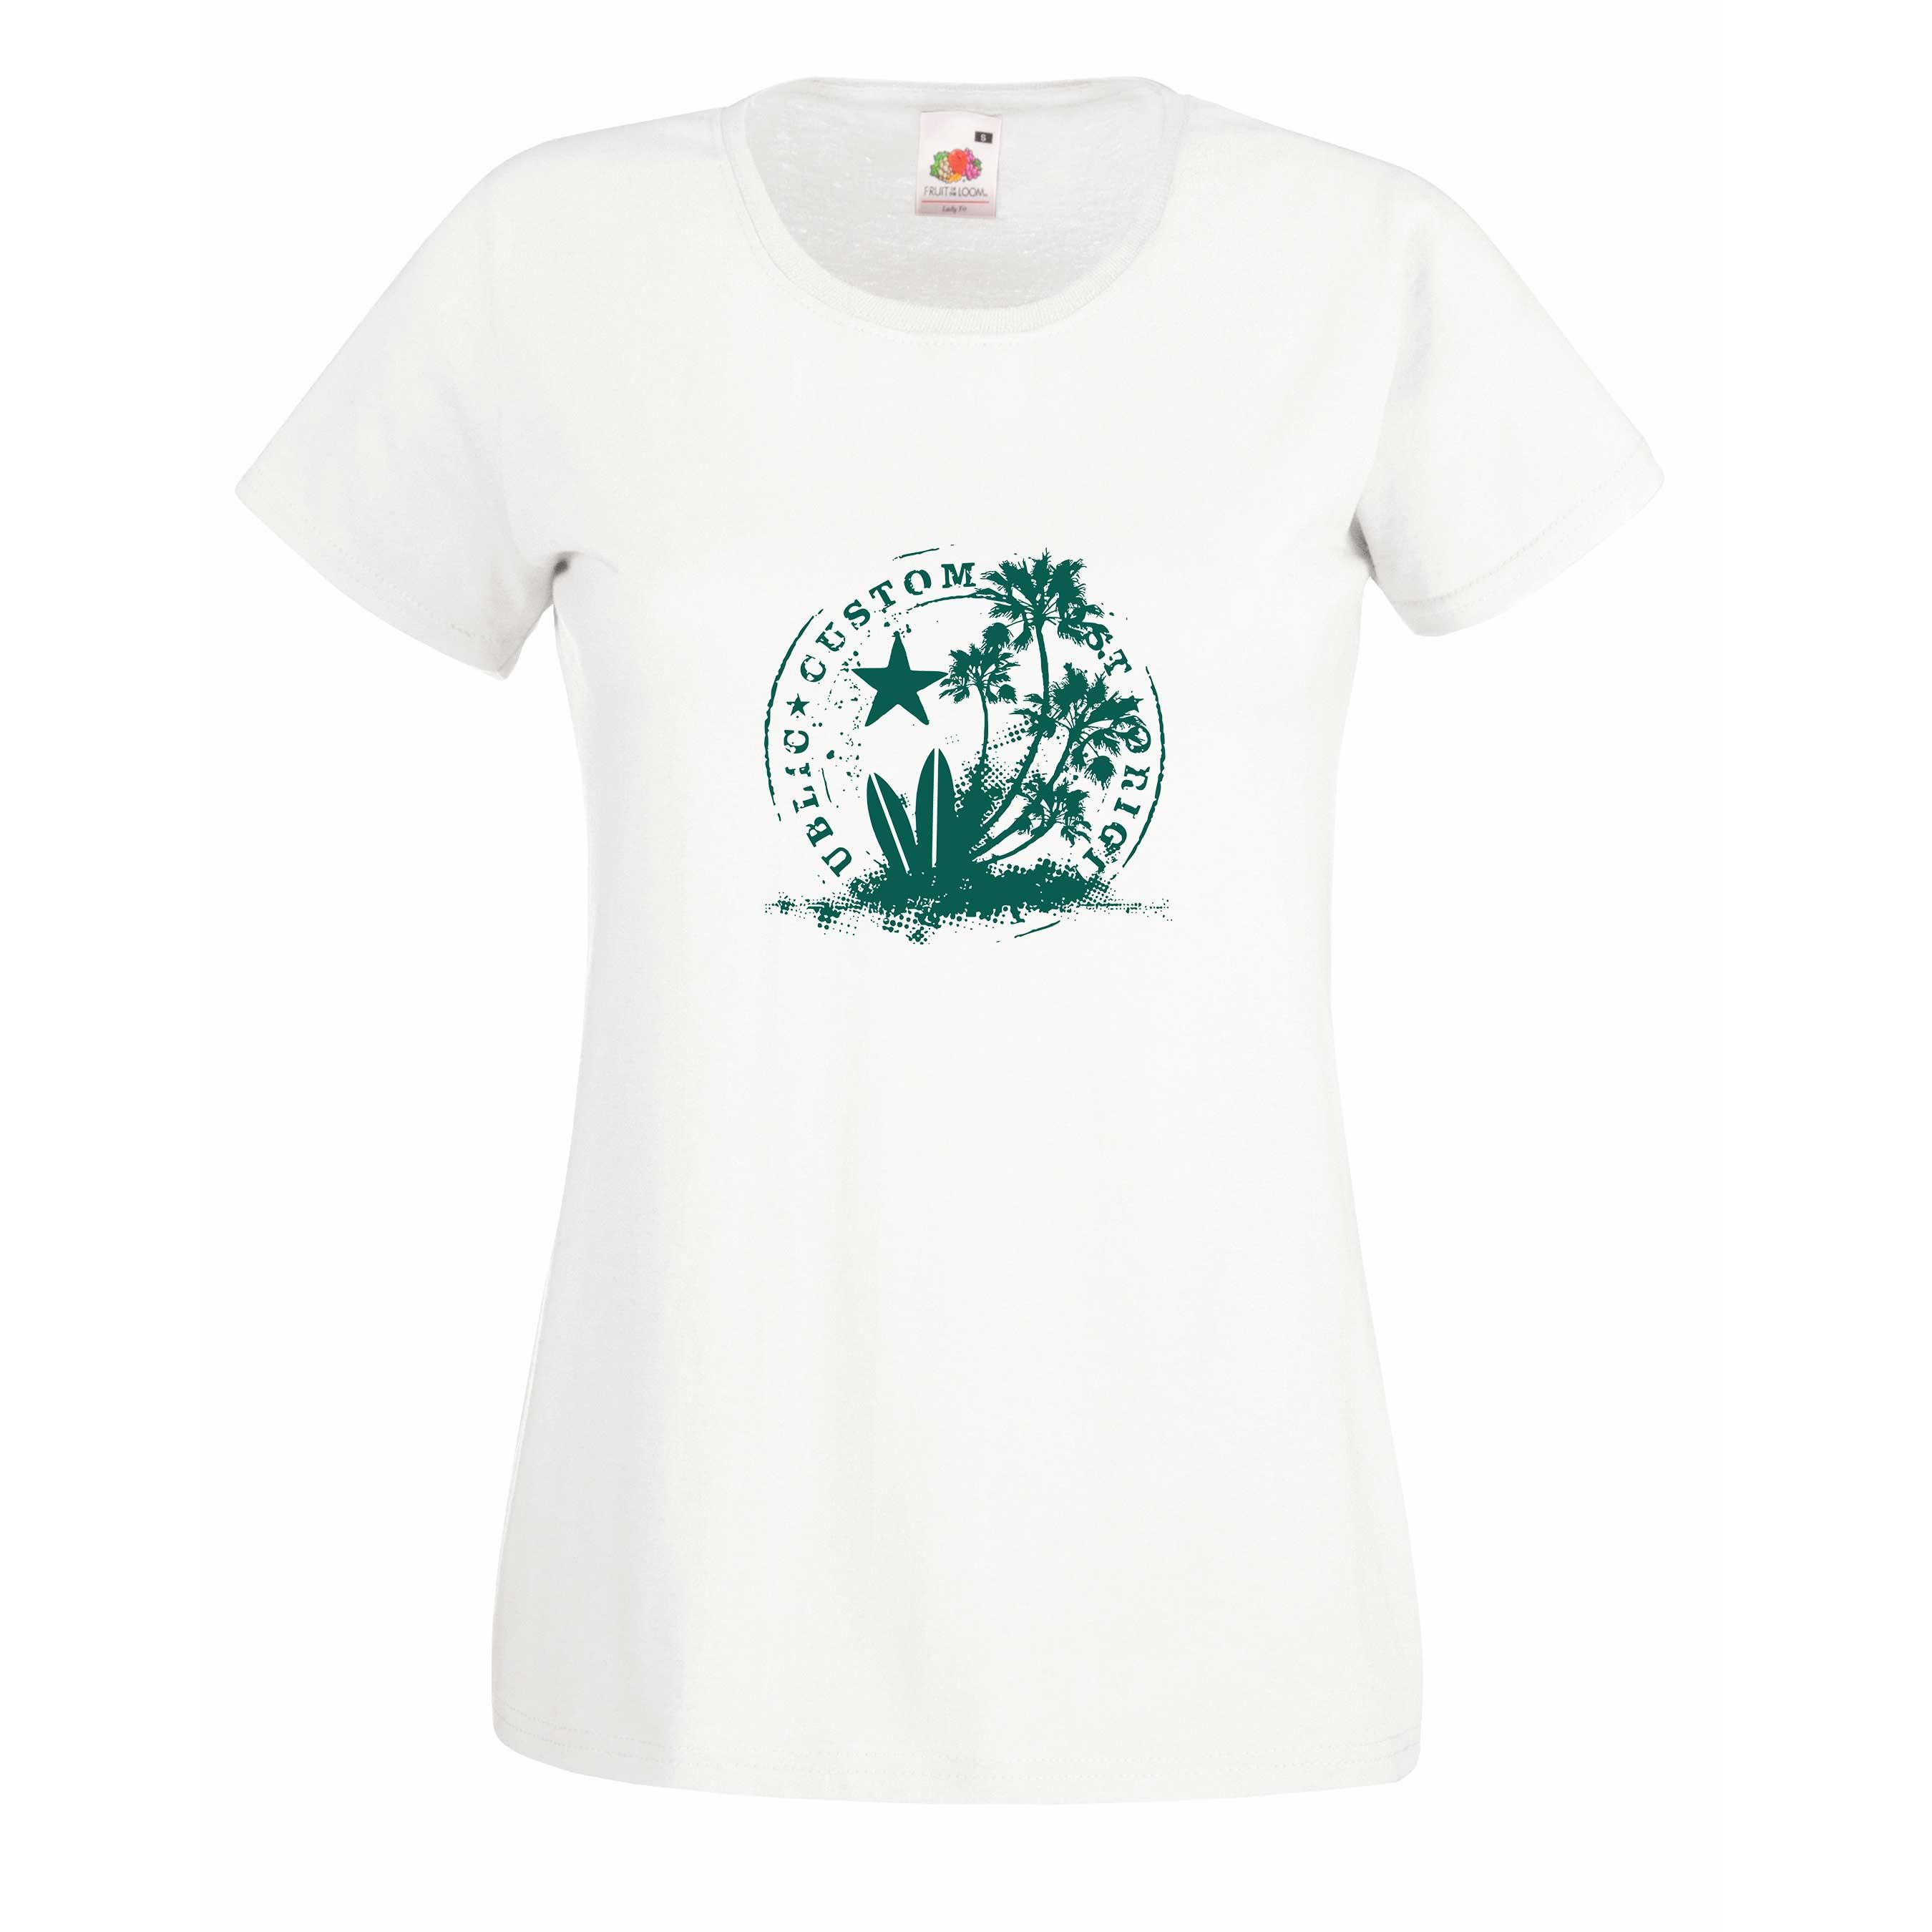 Custom design for t-shirt, hoodie & sweatshirt